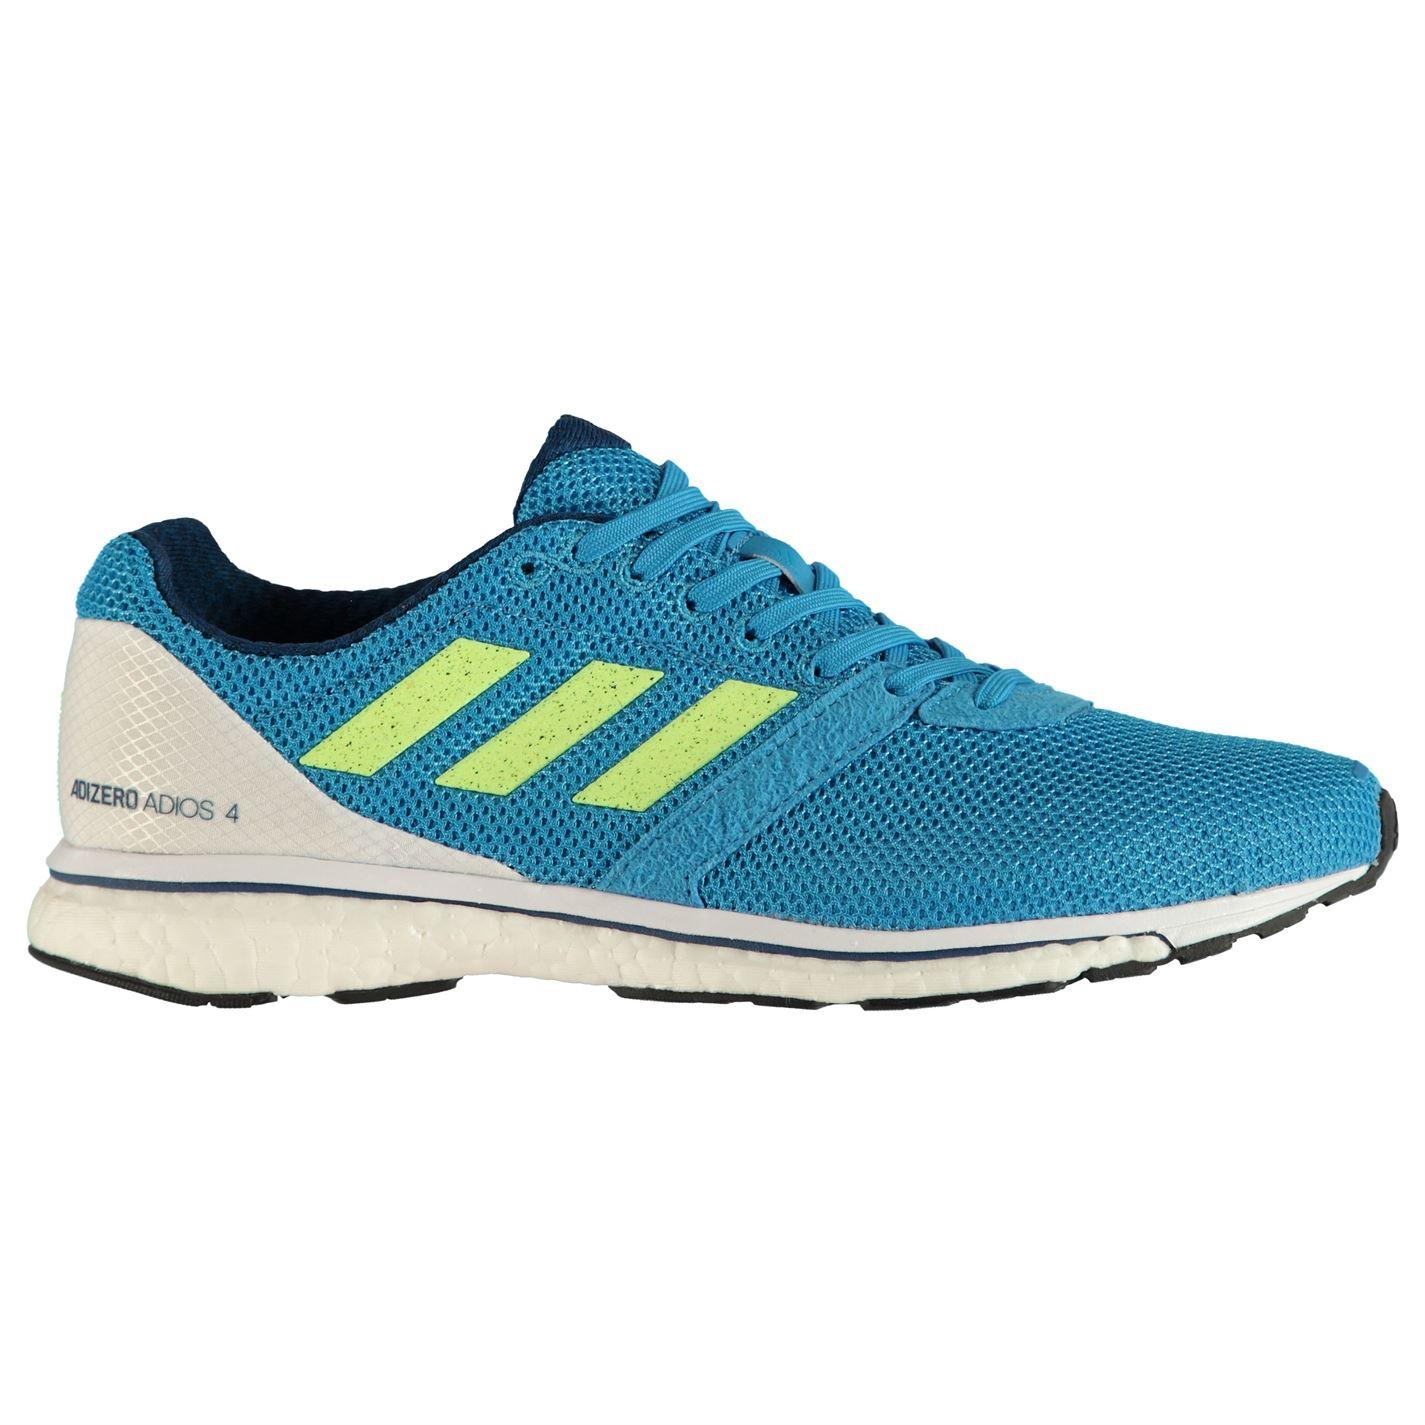 boty adidas adizero Adios pánské Running Shoes Blue Wht Grn - Glami.cz 5ed0875884